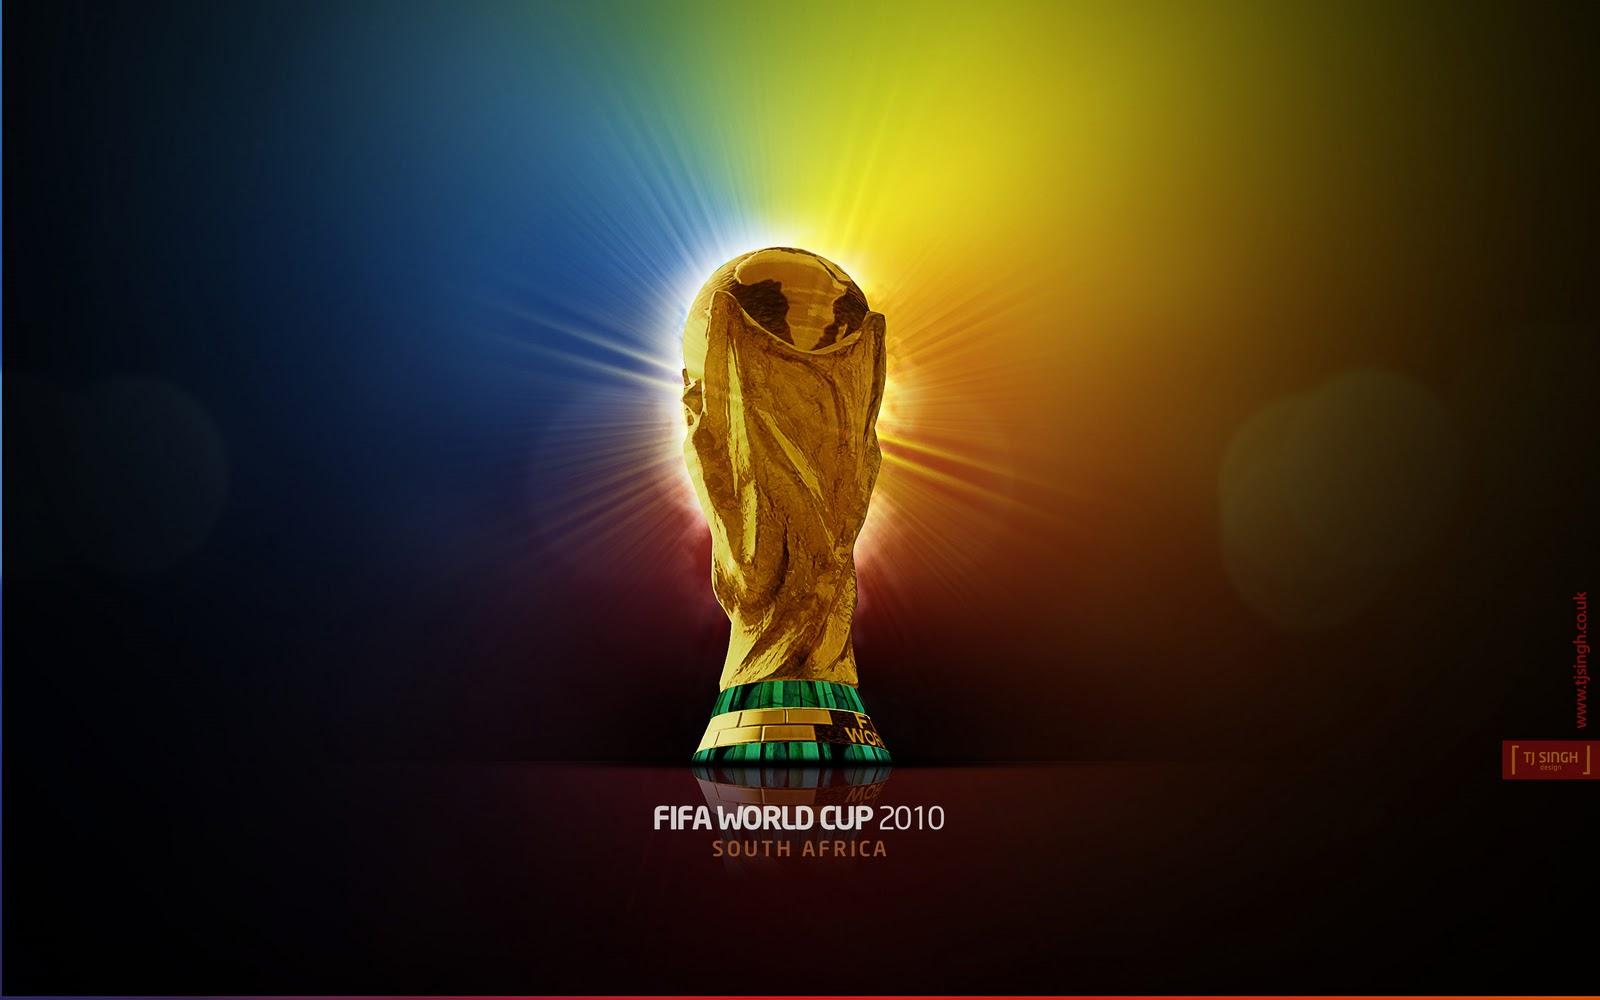 http://2.bp.blogspot.com/_Vk2ir6UMOjY/TDXoAxw5a3I/AAAAAAAAAPI/Q9p9Ikpav0A/s1600/FIFA-World-Cup-2010-Trophy-Wallpaper.jpg